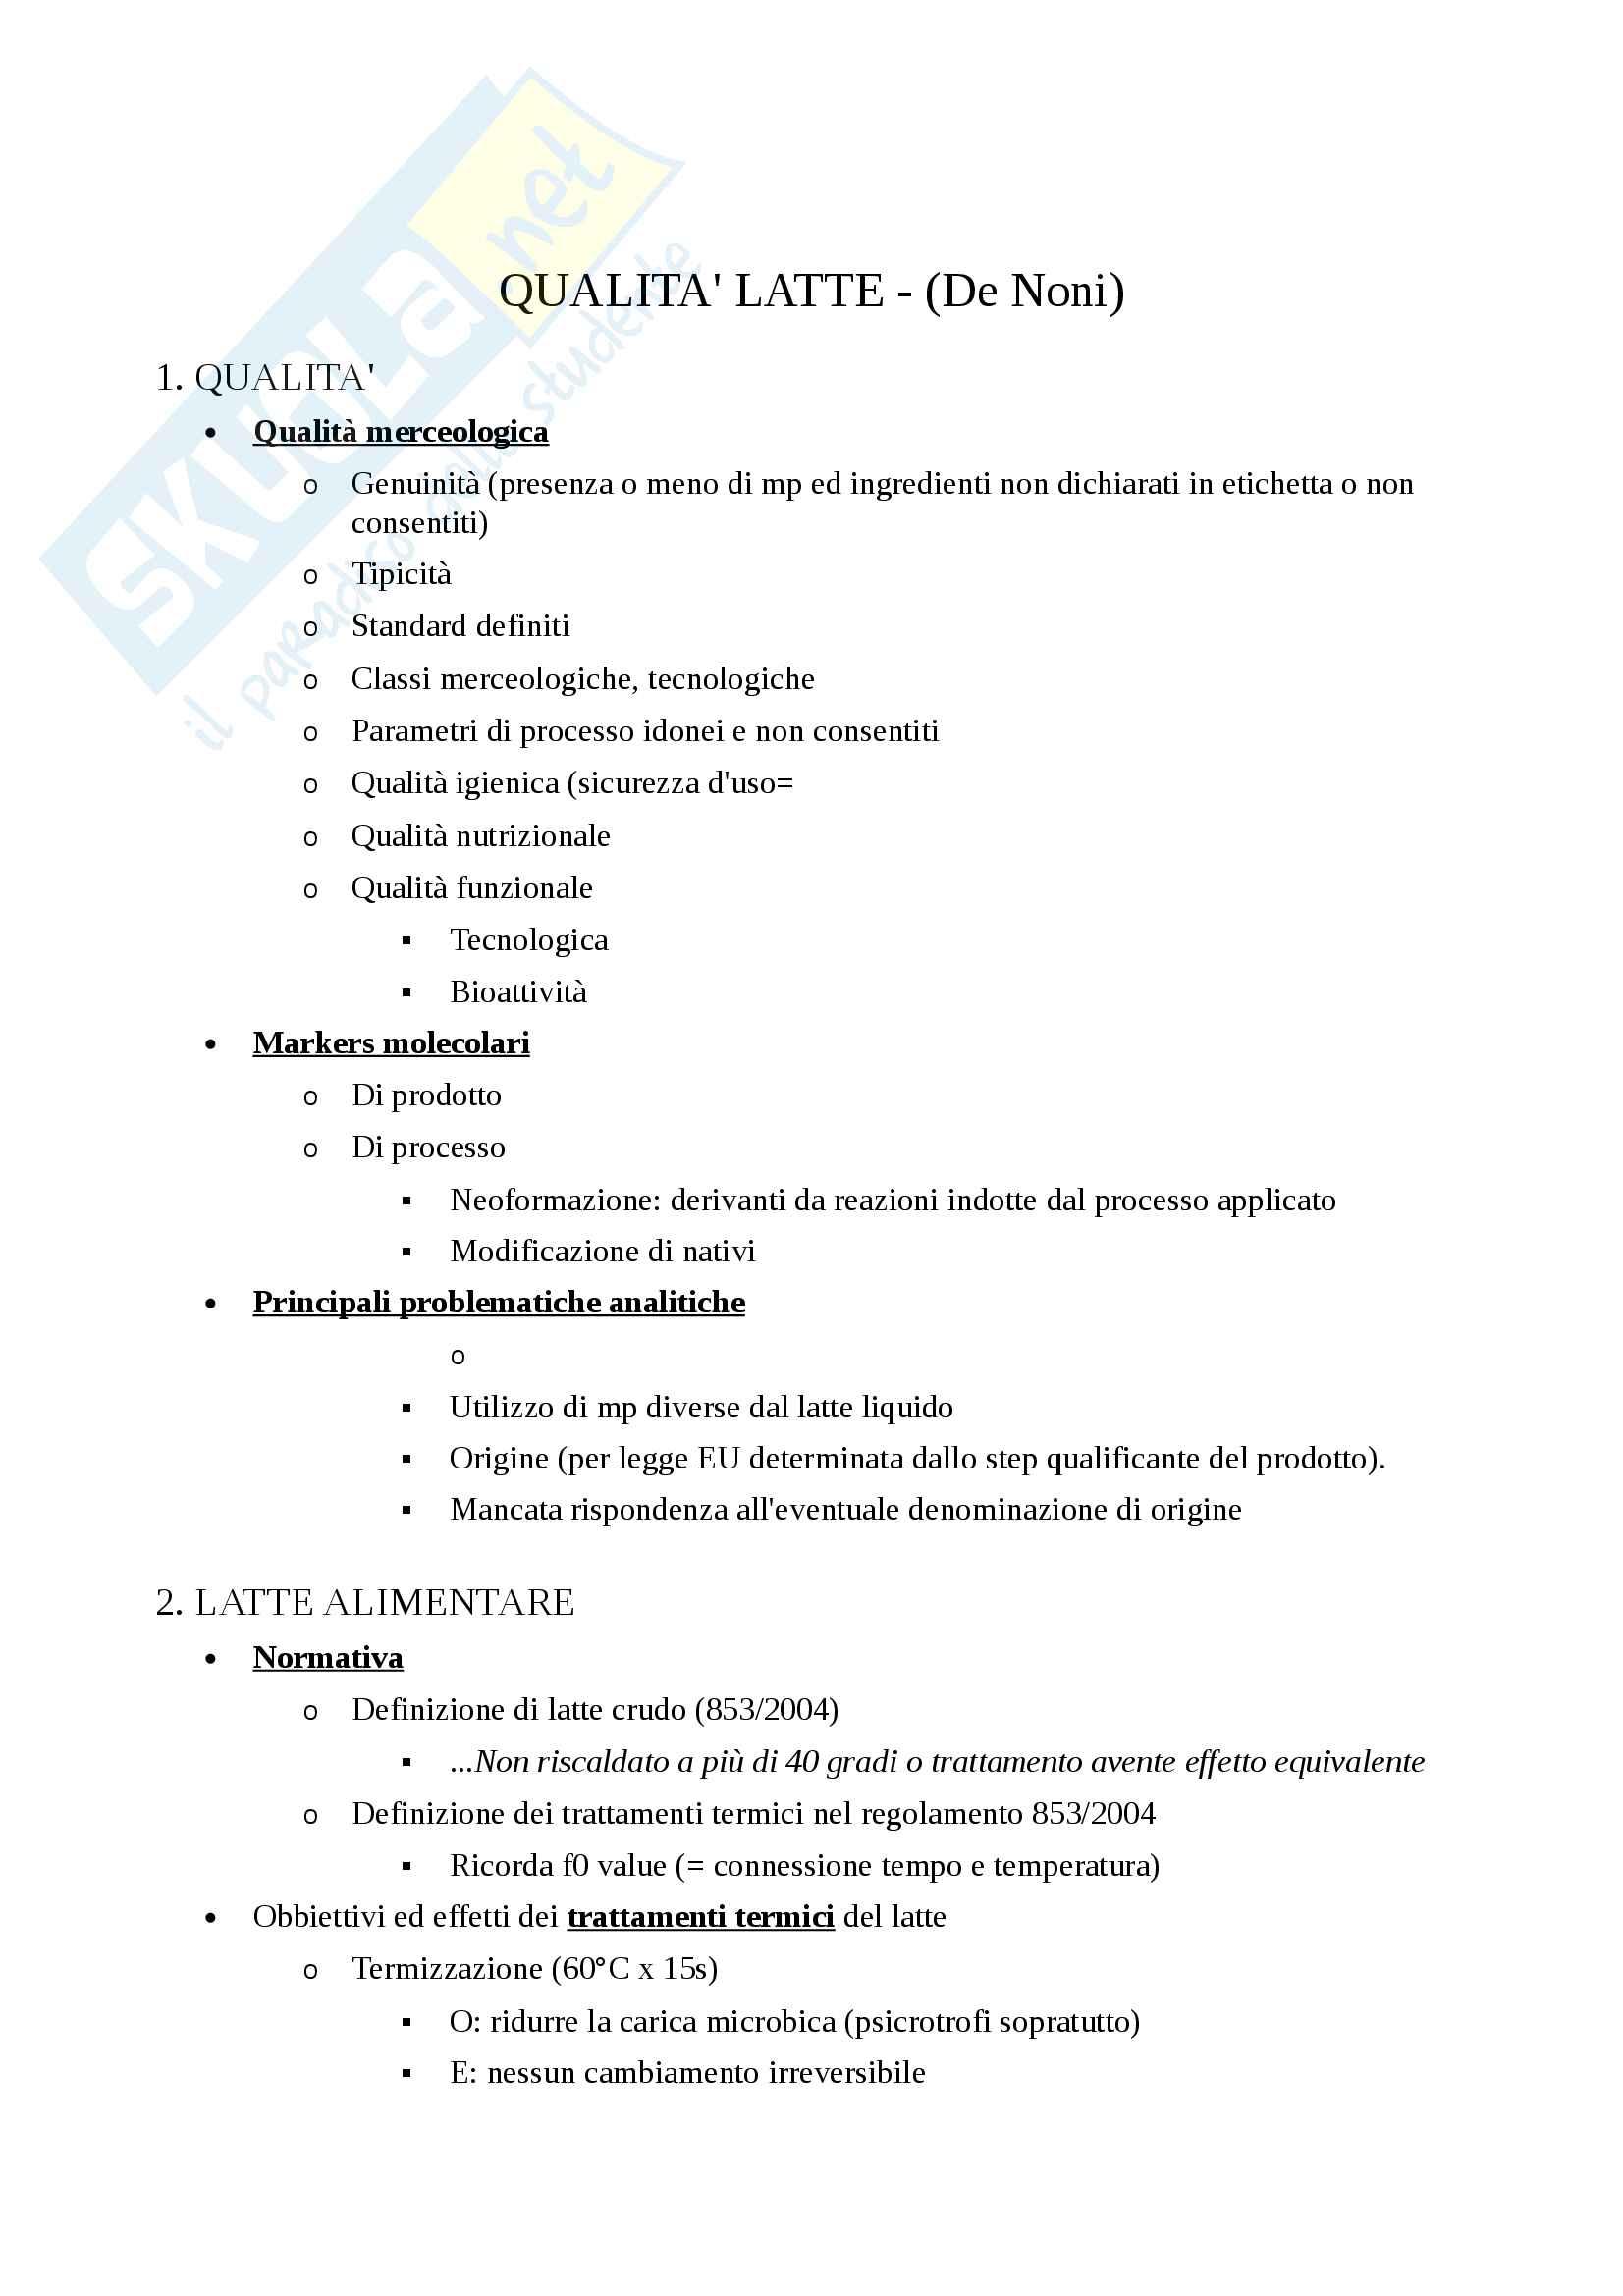 prof. De Noni Qualità Funzionalità Latte Derivati, Appunti di lezione